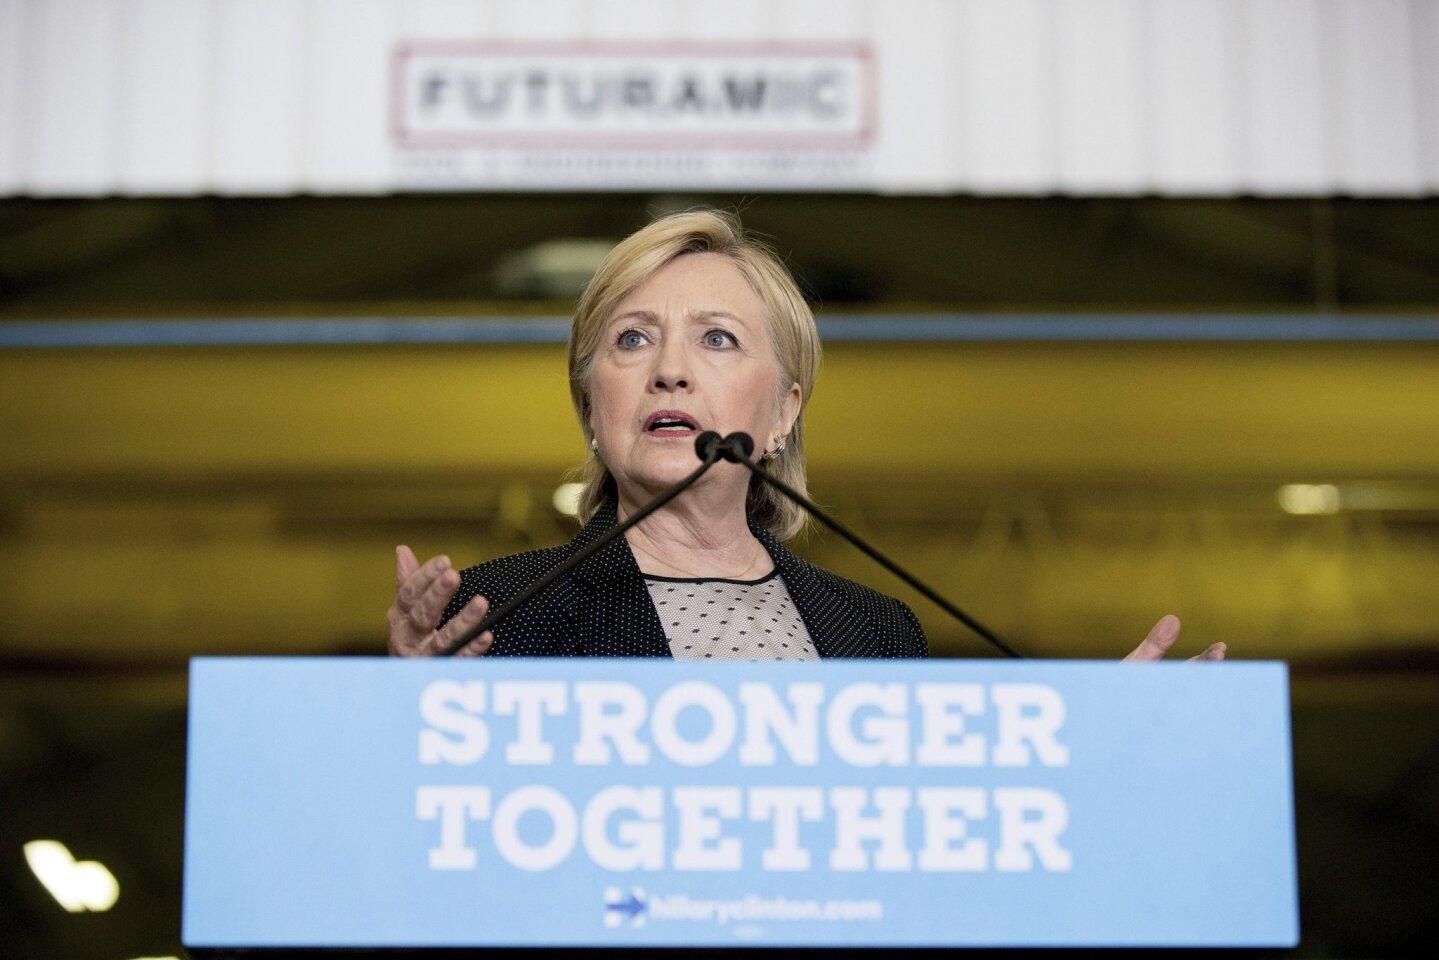 Hillary Clinton's economic policy